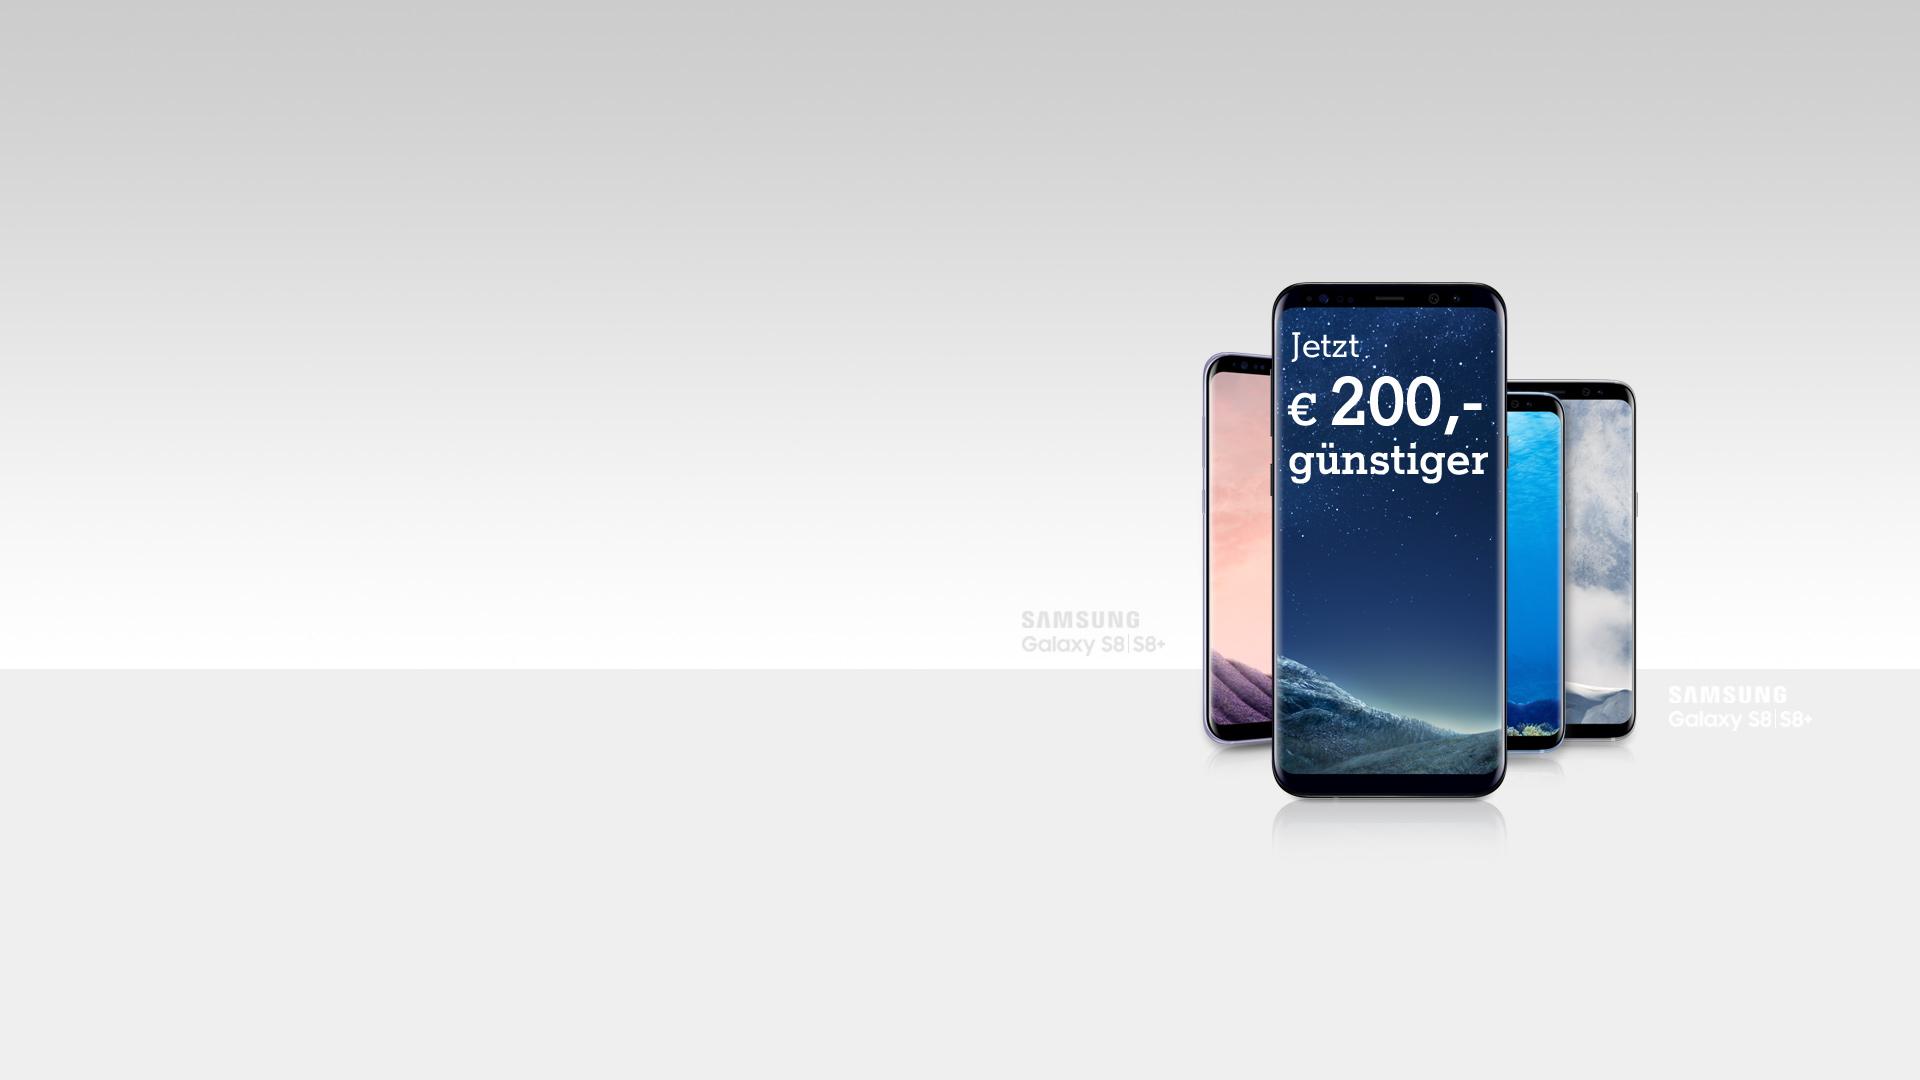 Samsung Galaxy S8 €200,- günstiger